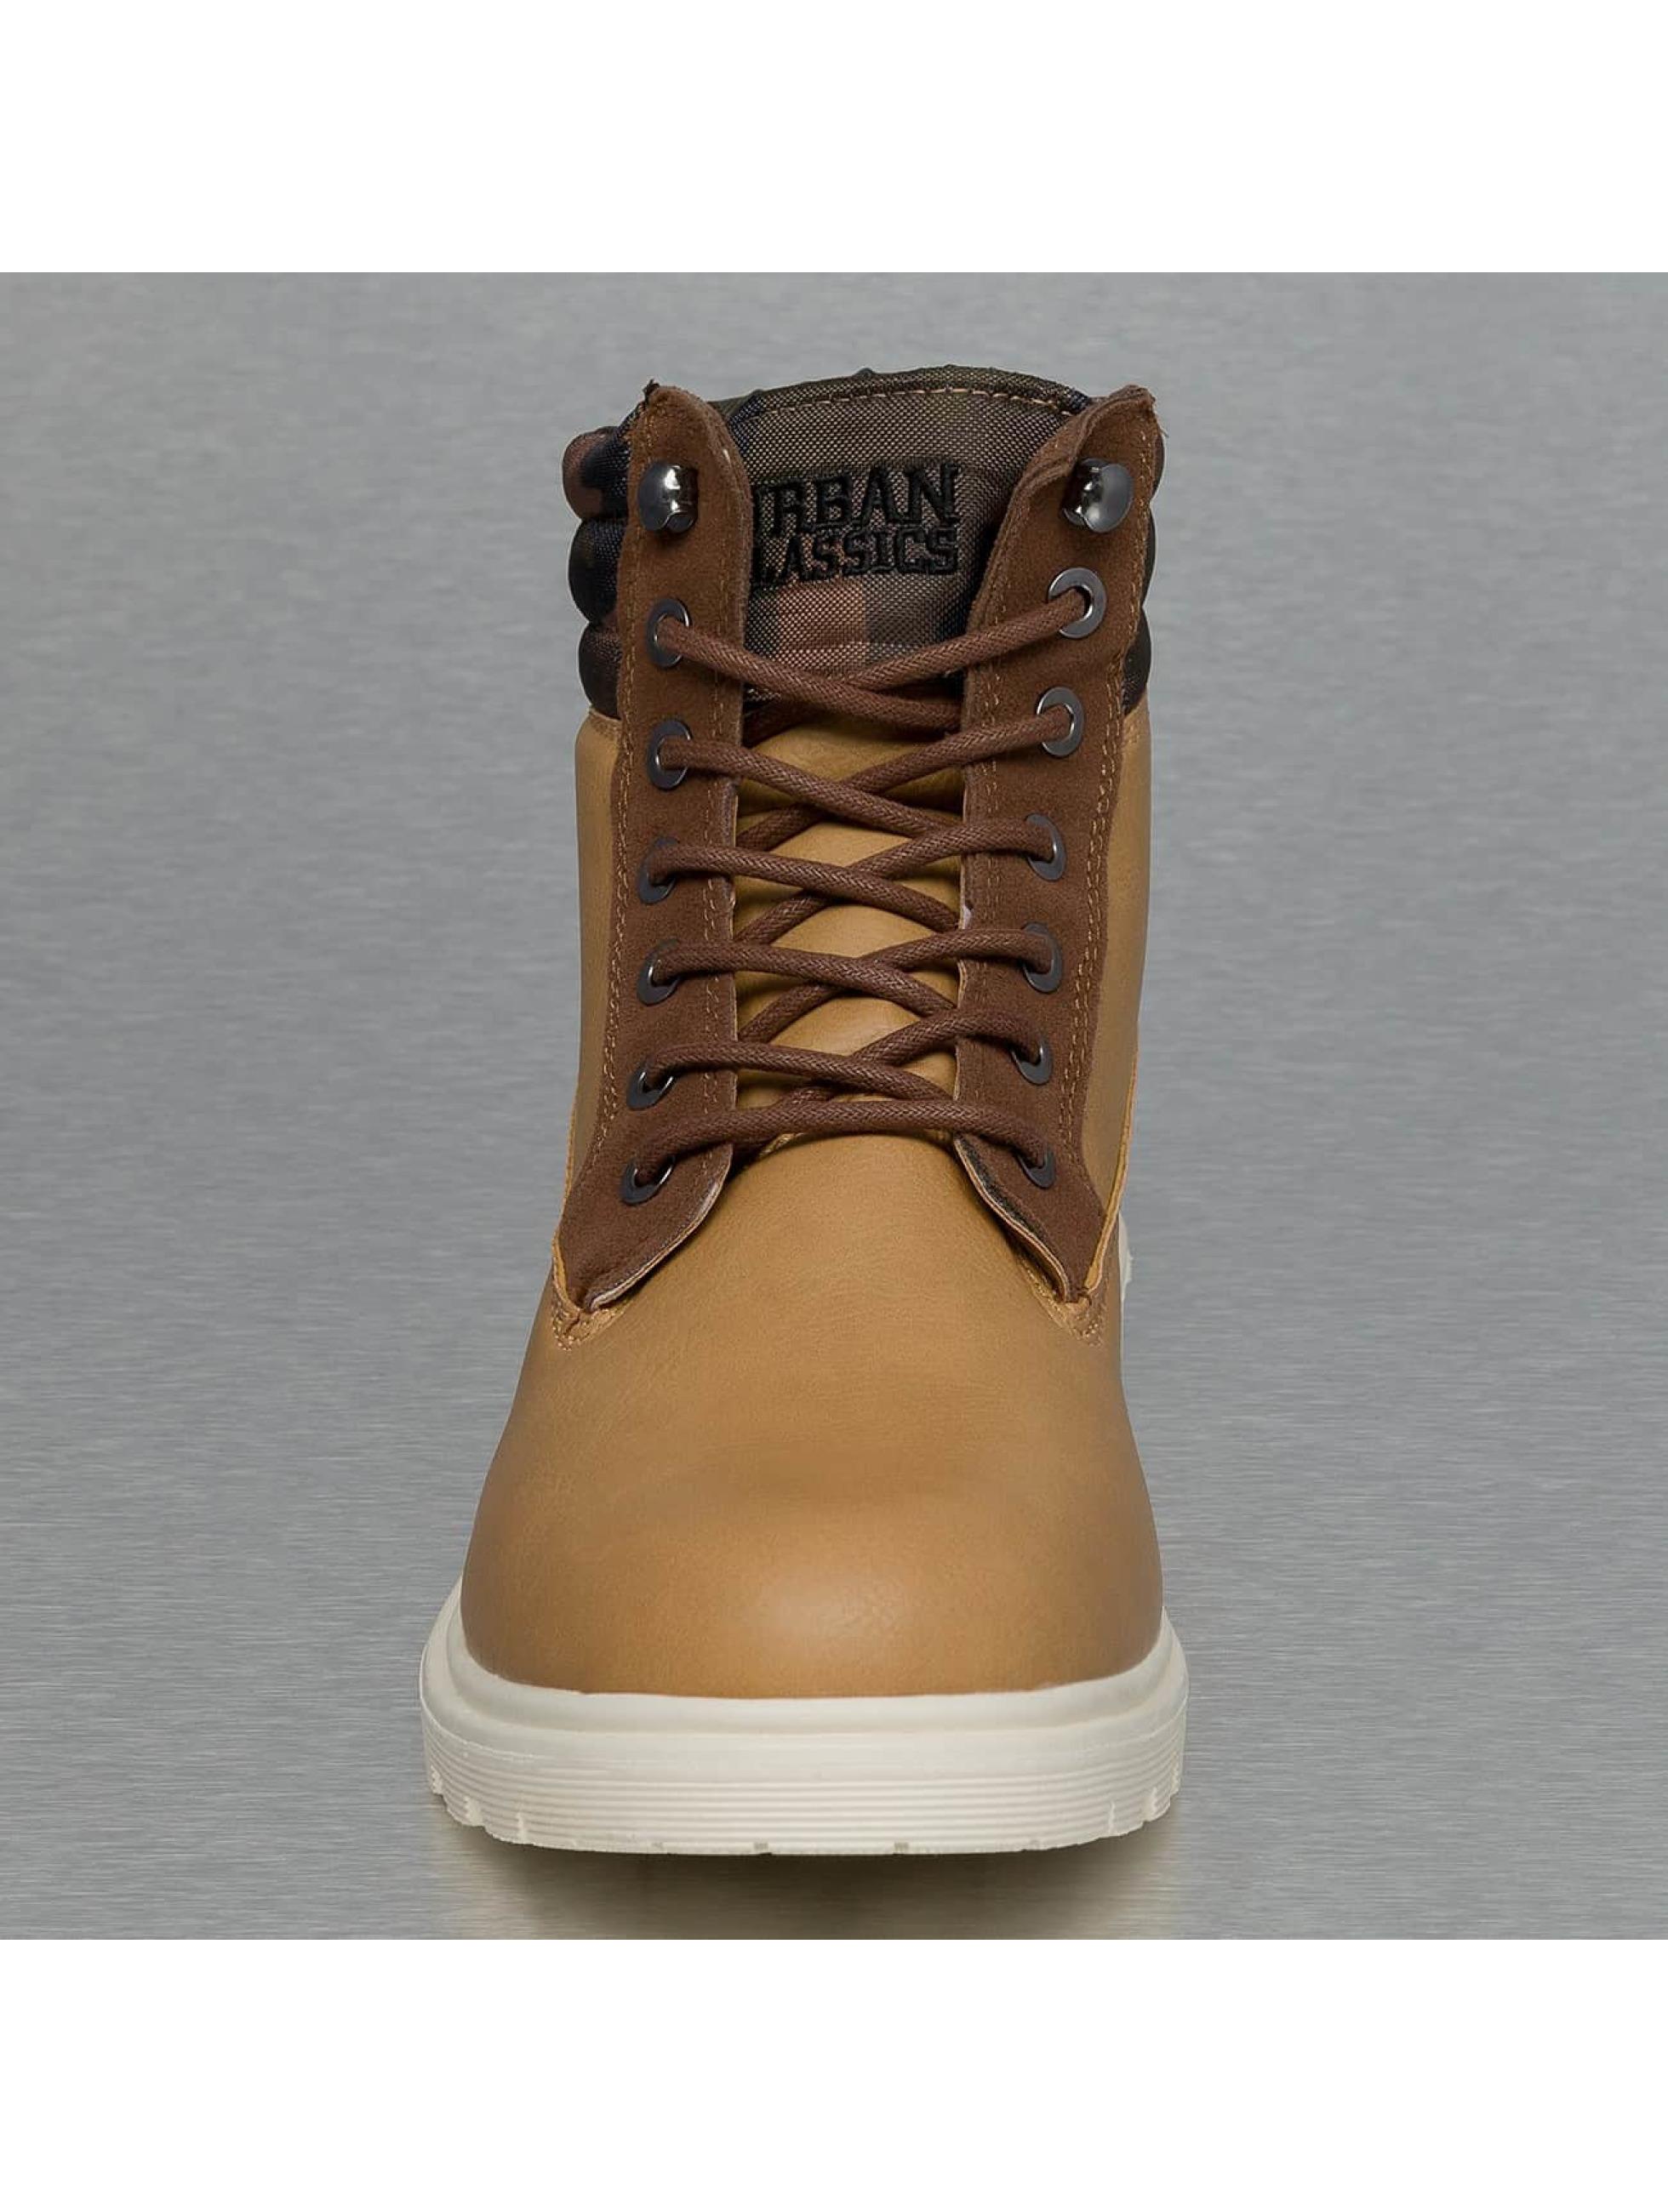 Urban Classics Čižmy/Boots Winter béžová